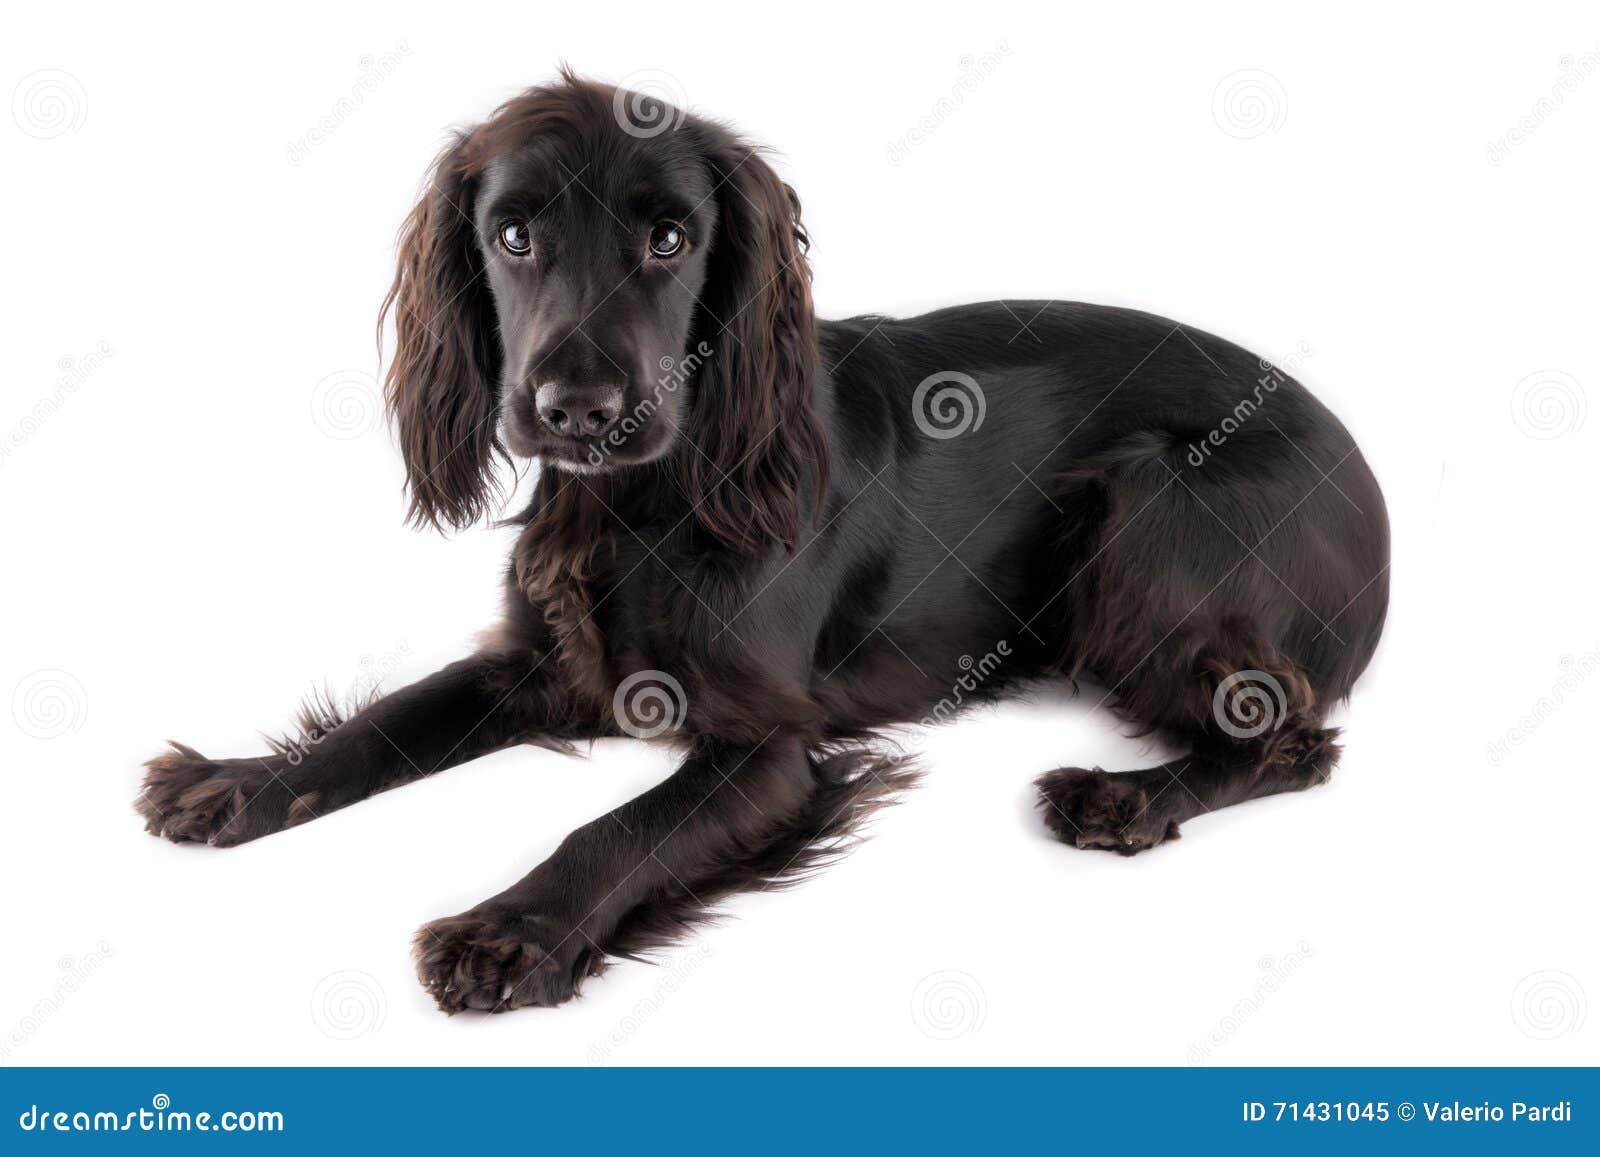 Young black cocker spaniel